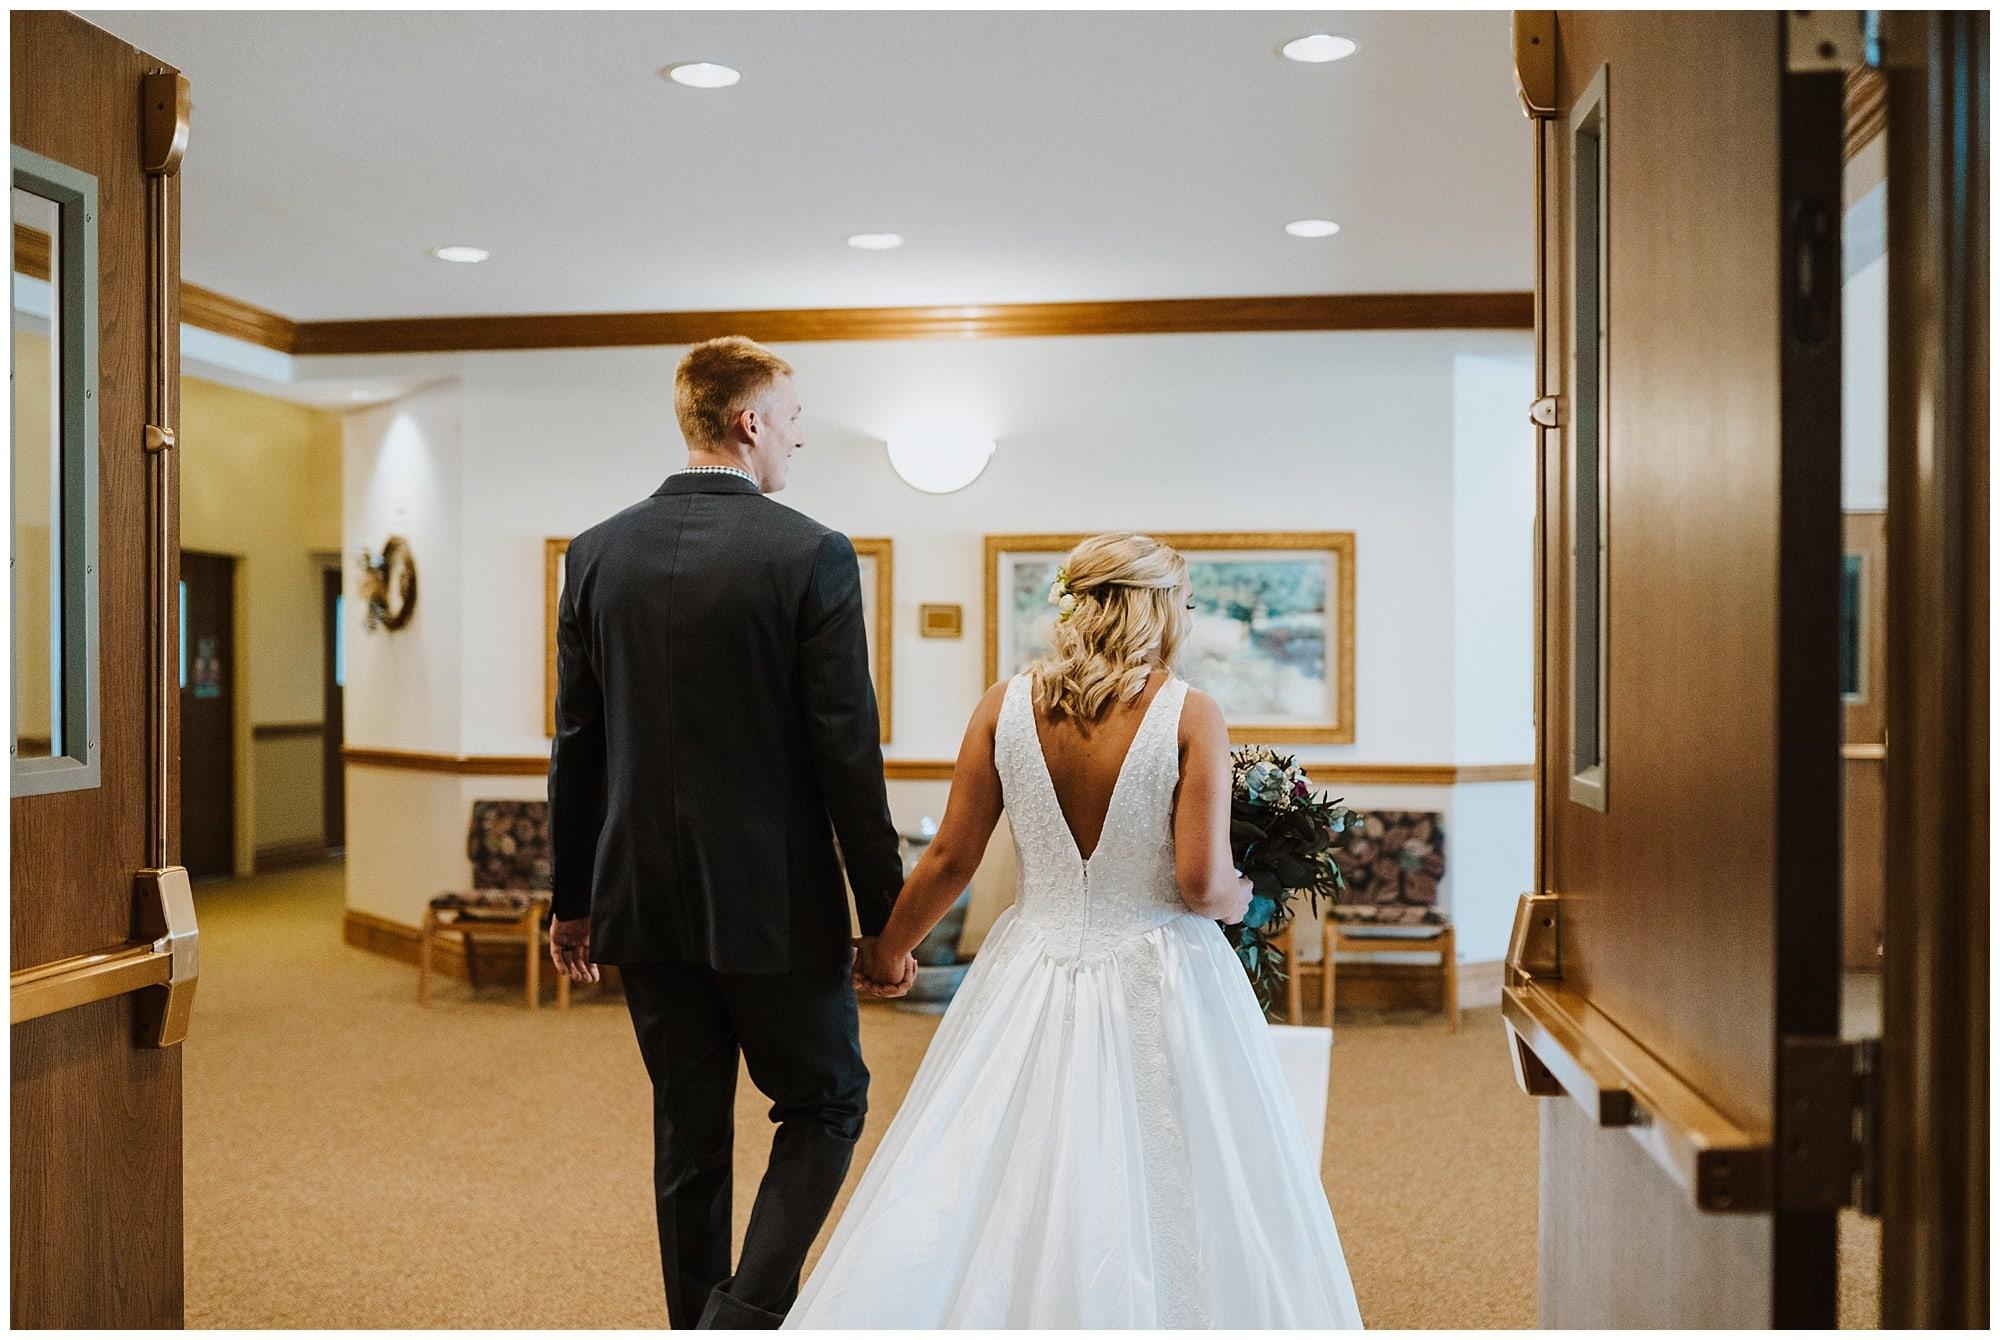 Adrian Michigan Wedding Photographer-43.JPG